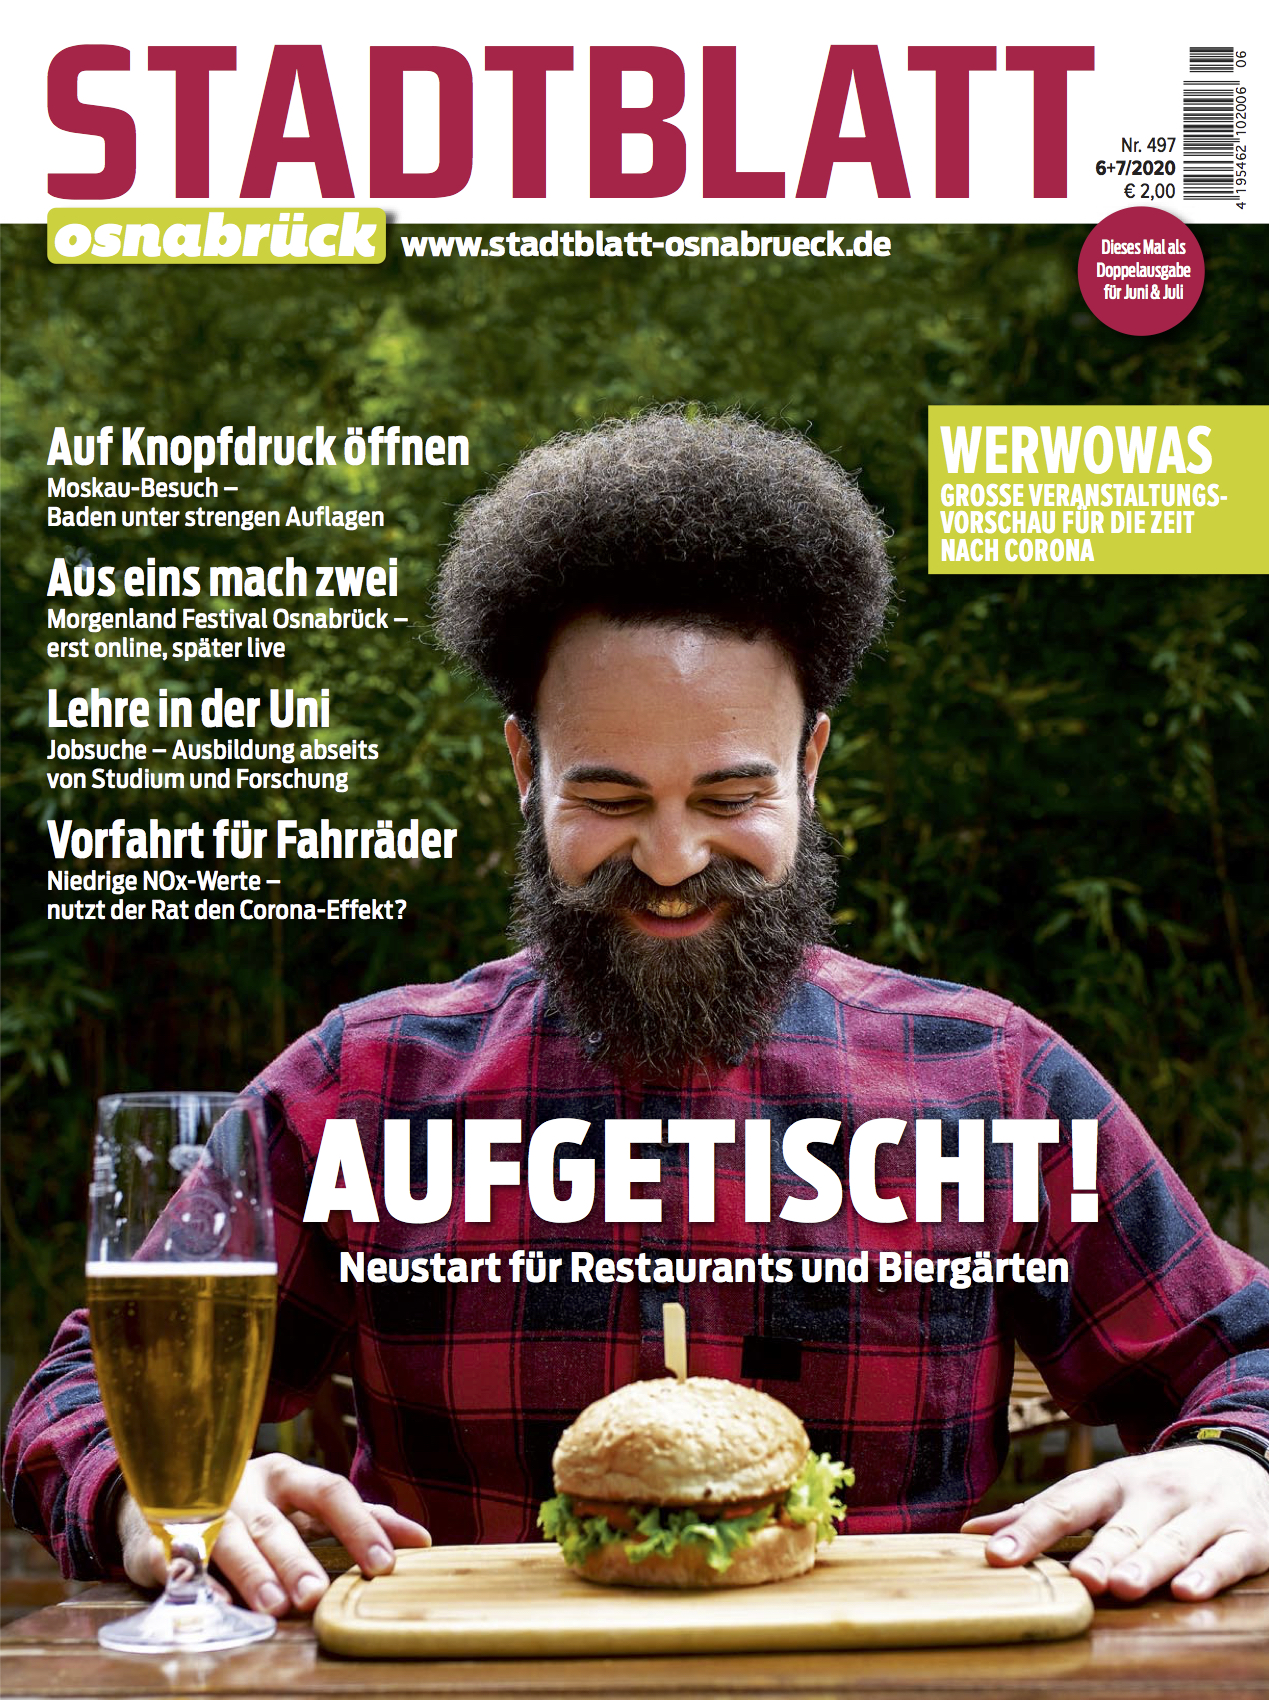 Stadtblatt_2020_06